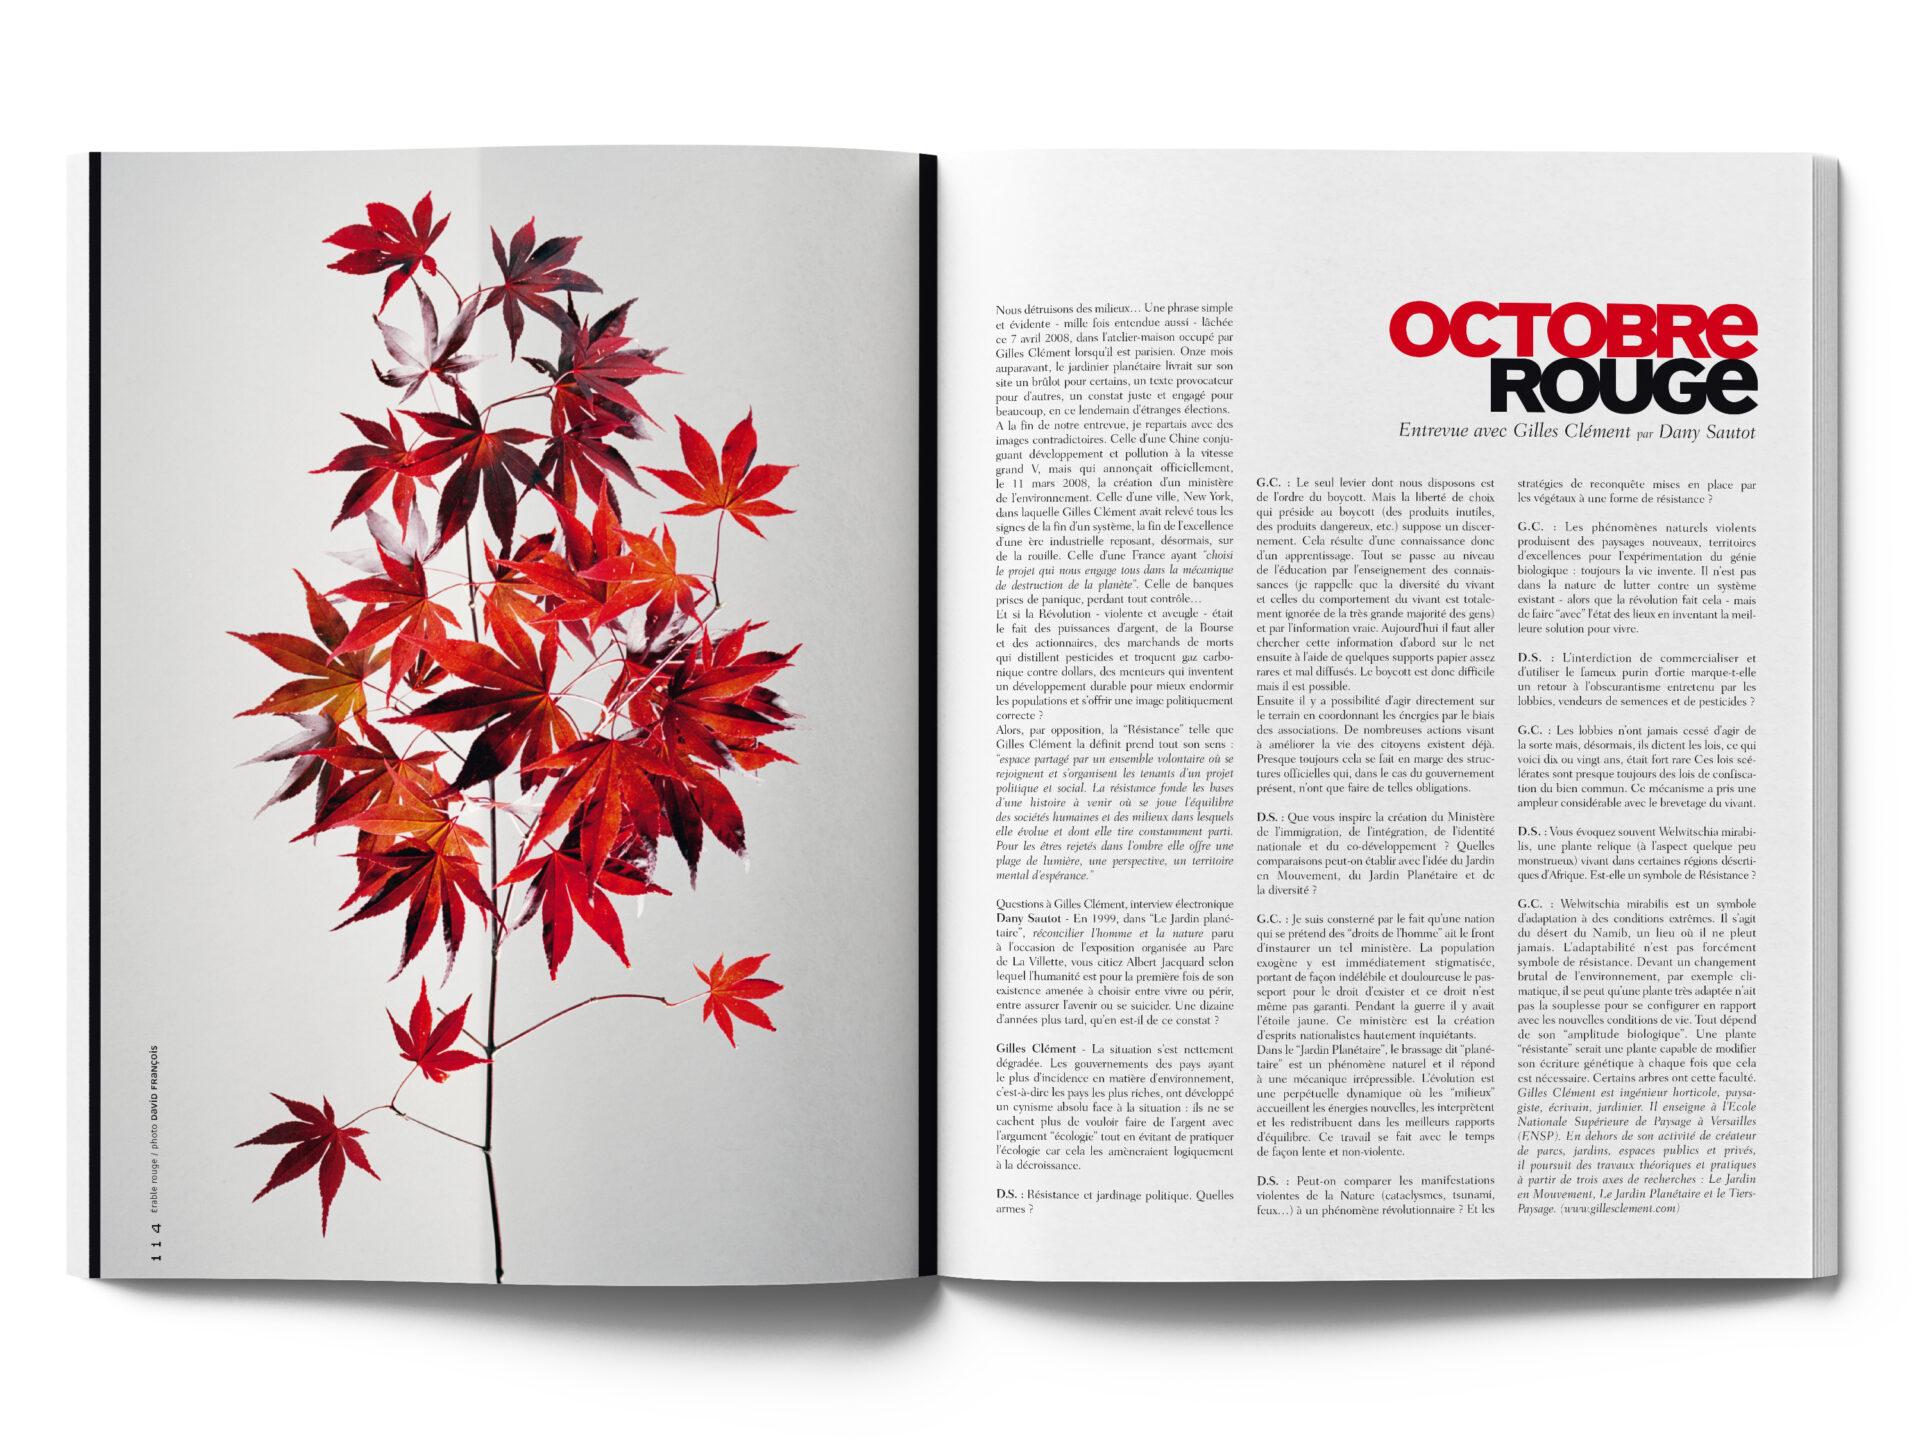 #3 Octobre rouge